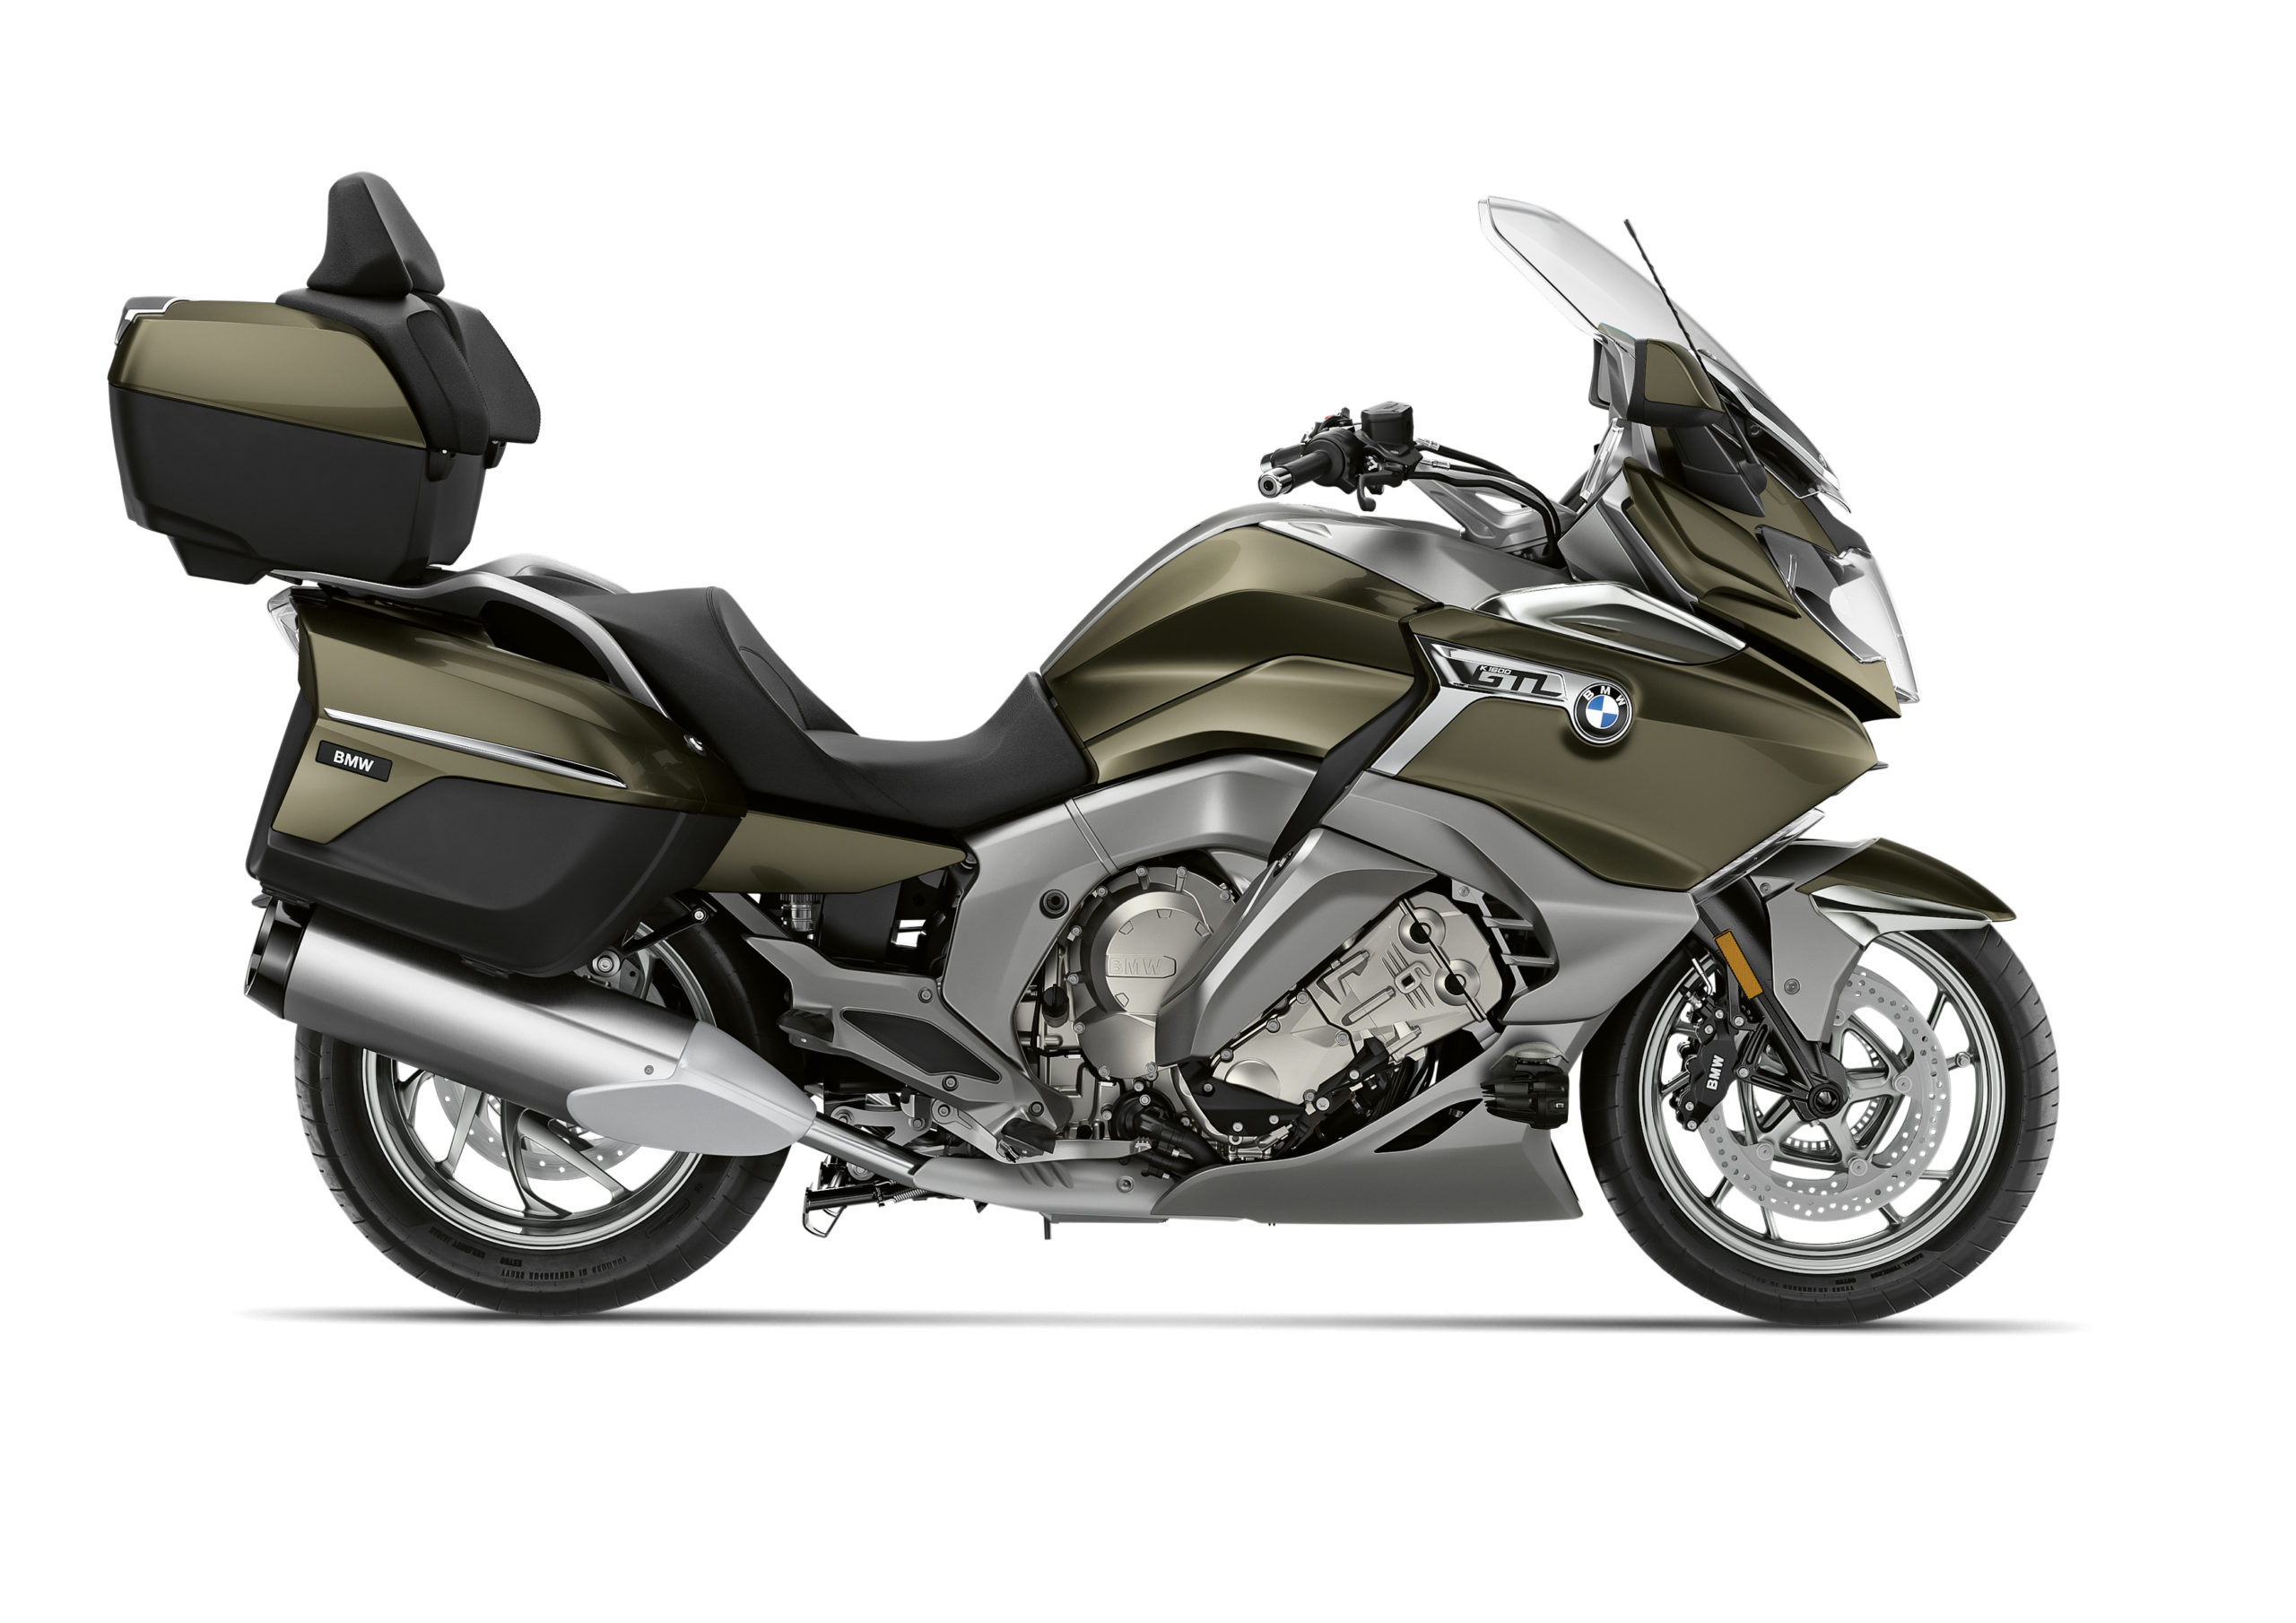 Bmw Motorrad Updates Its 2021 Motorcycle Model Range Drivemag Riders